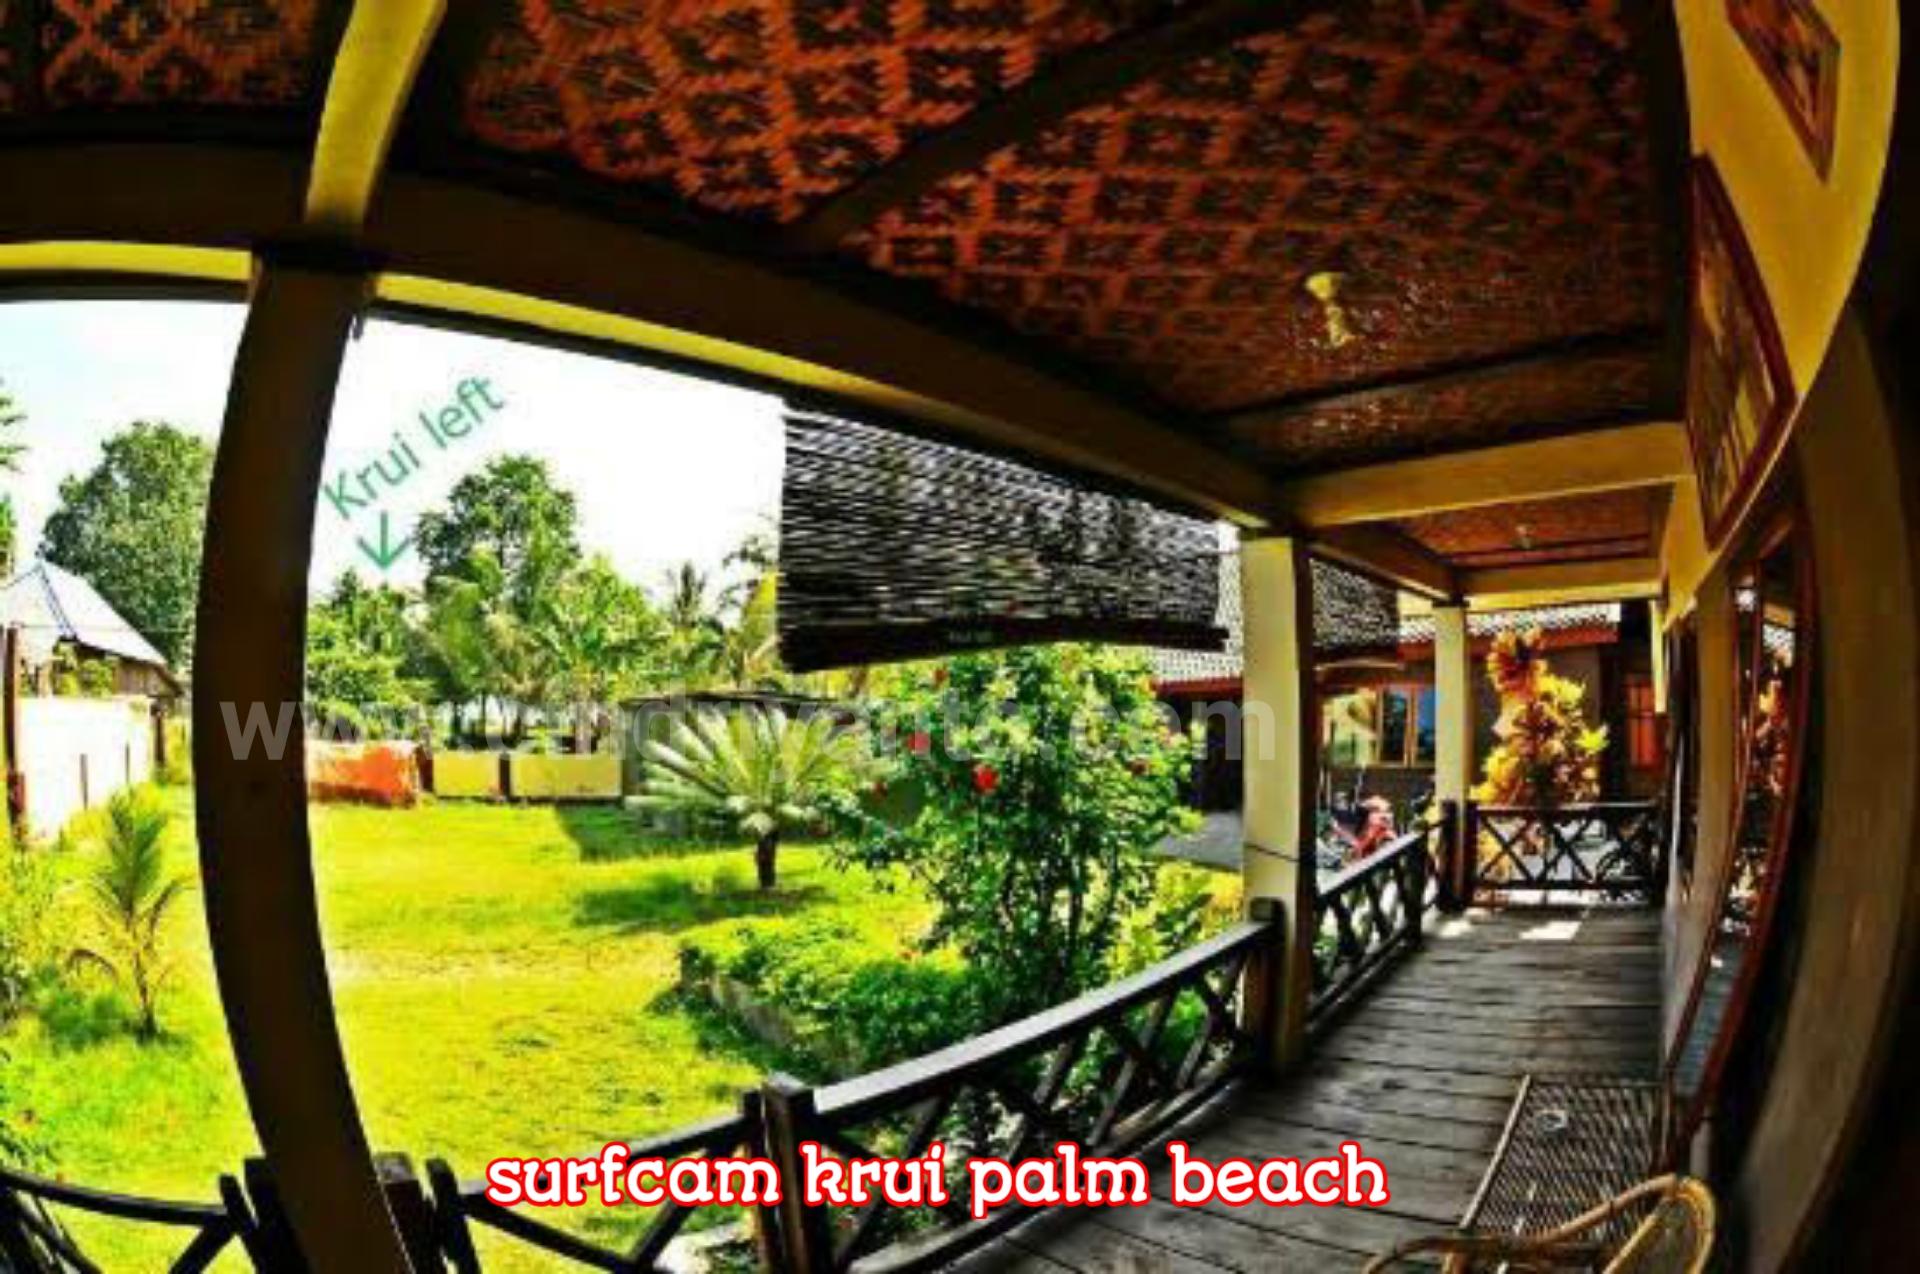 villa di pesisir barat Villa di krui Surfcamp Krui Palmbeach